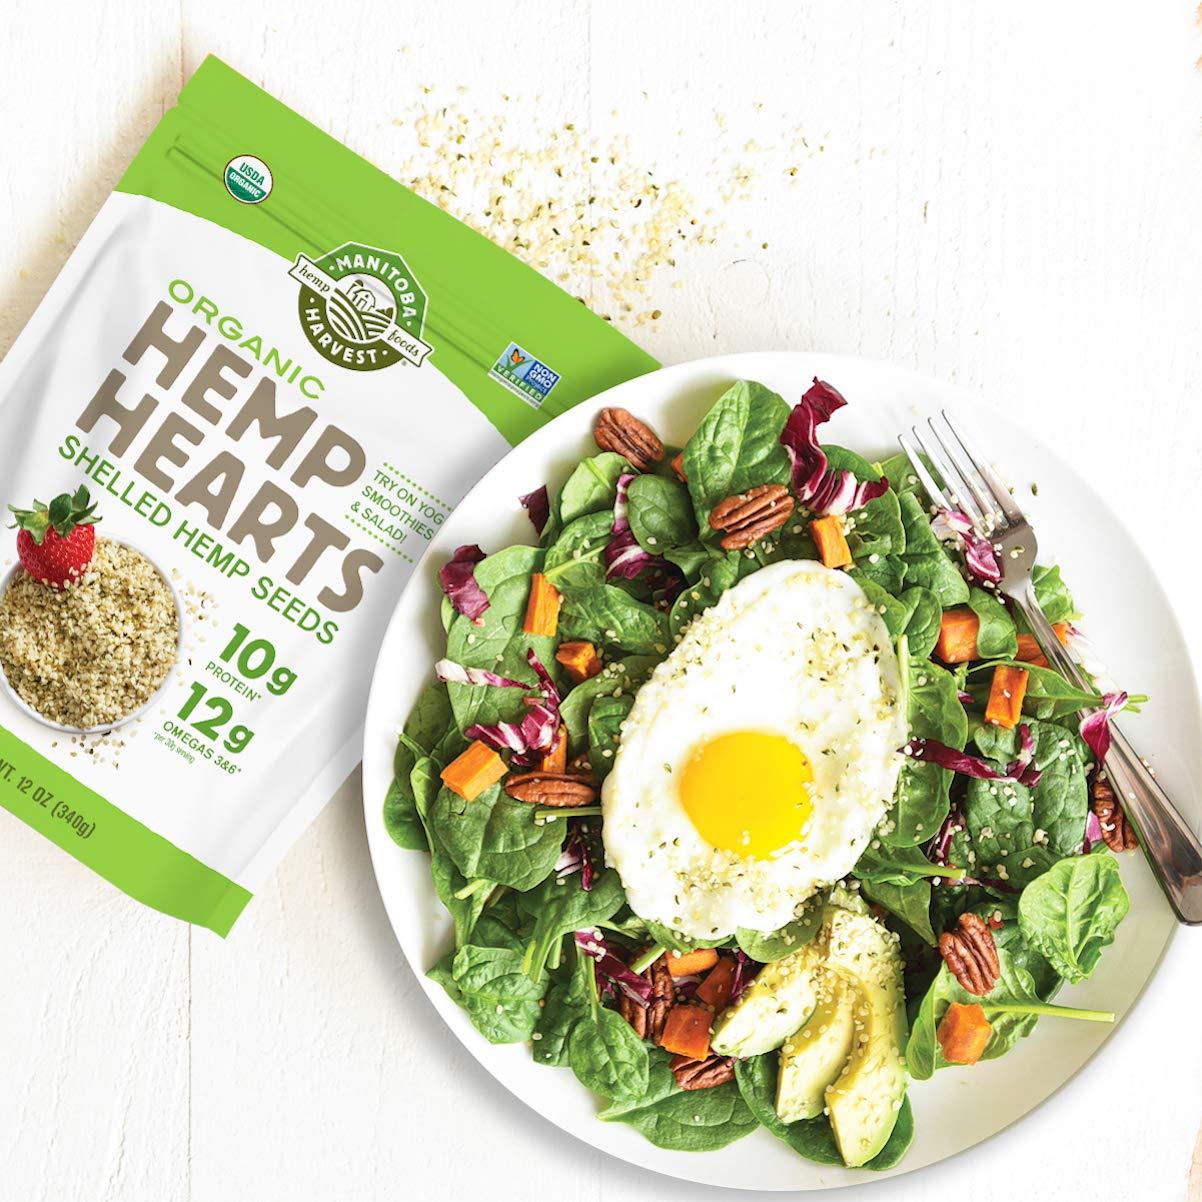 Manitoba Harvest Organic Hemp Hearts Raw Shelled Hemp Seeds Whole Food Muscle Club